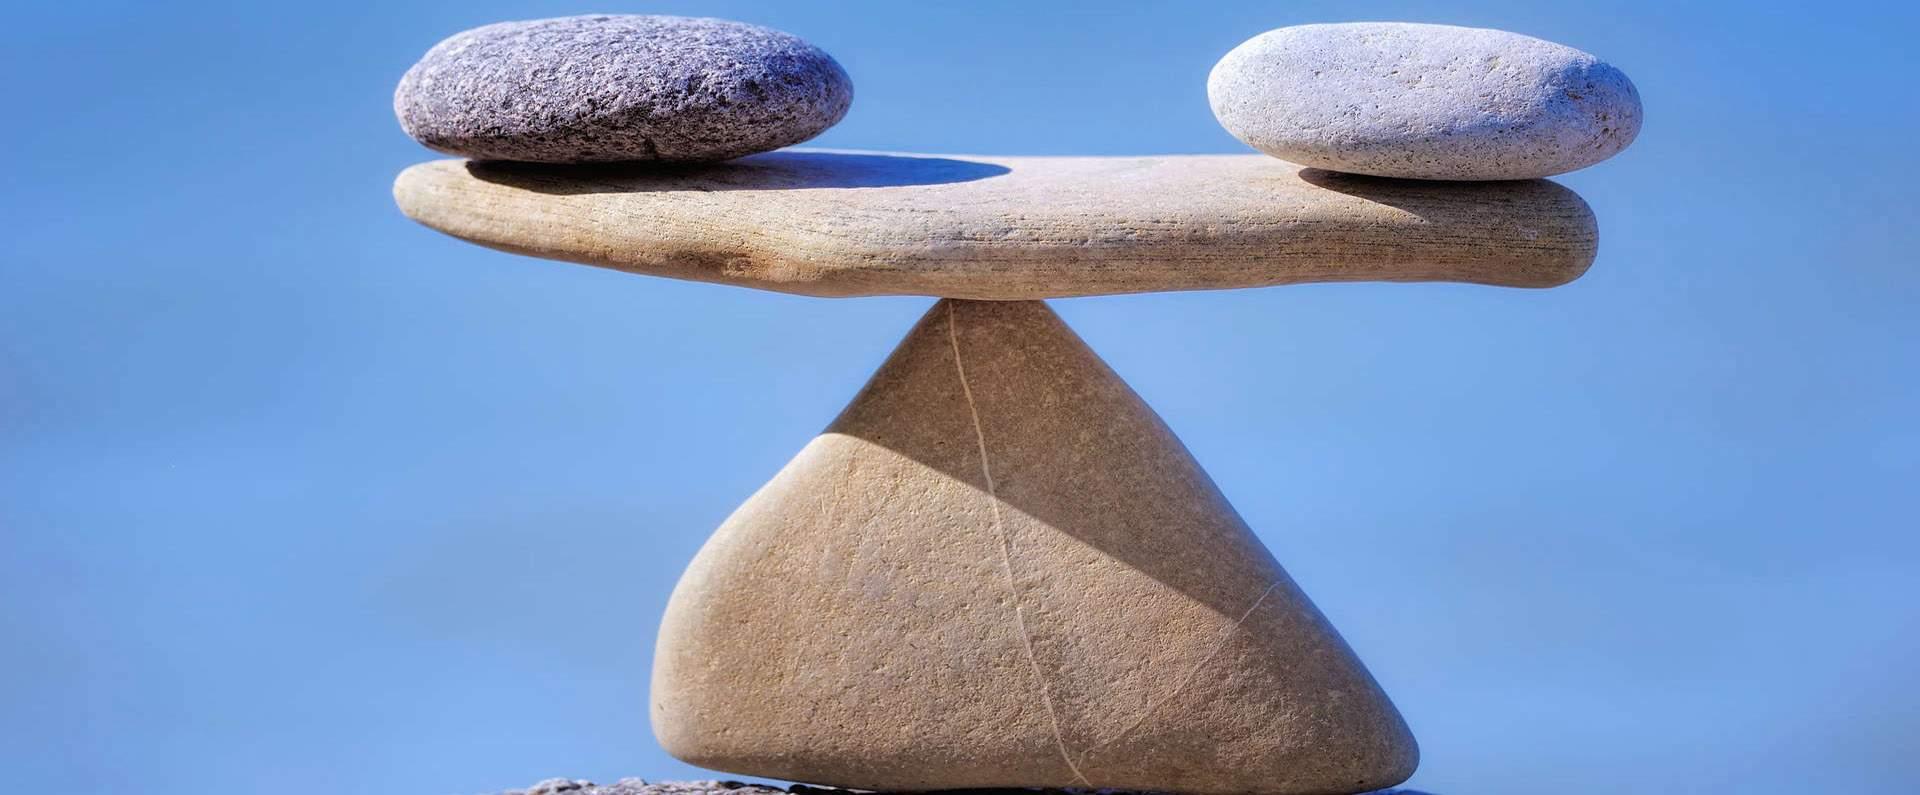 balance method topbig jopt